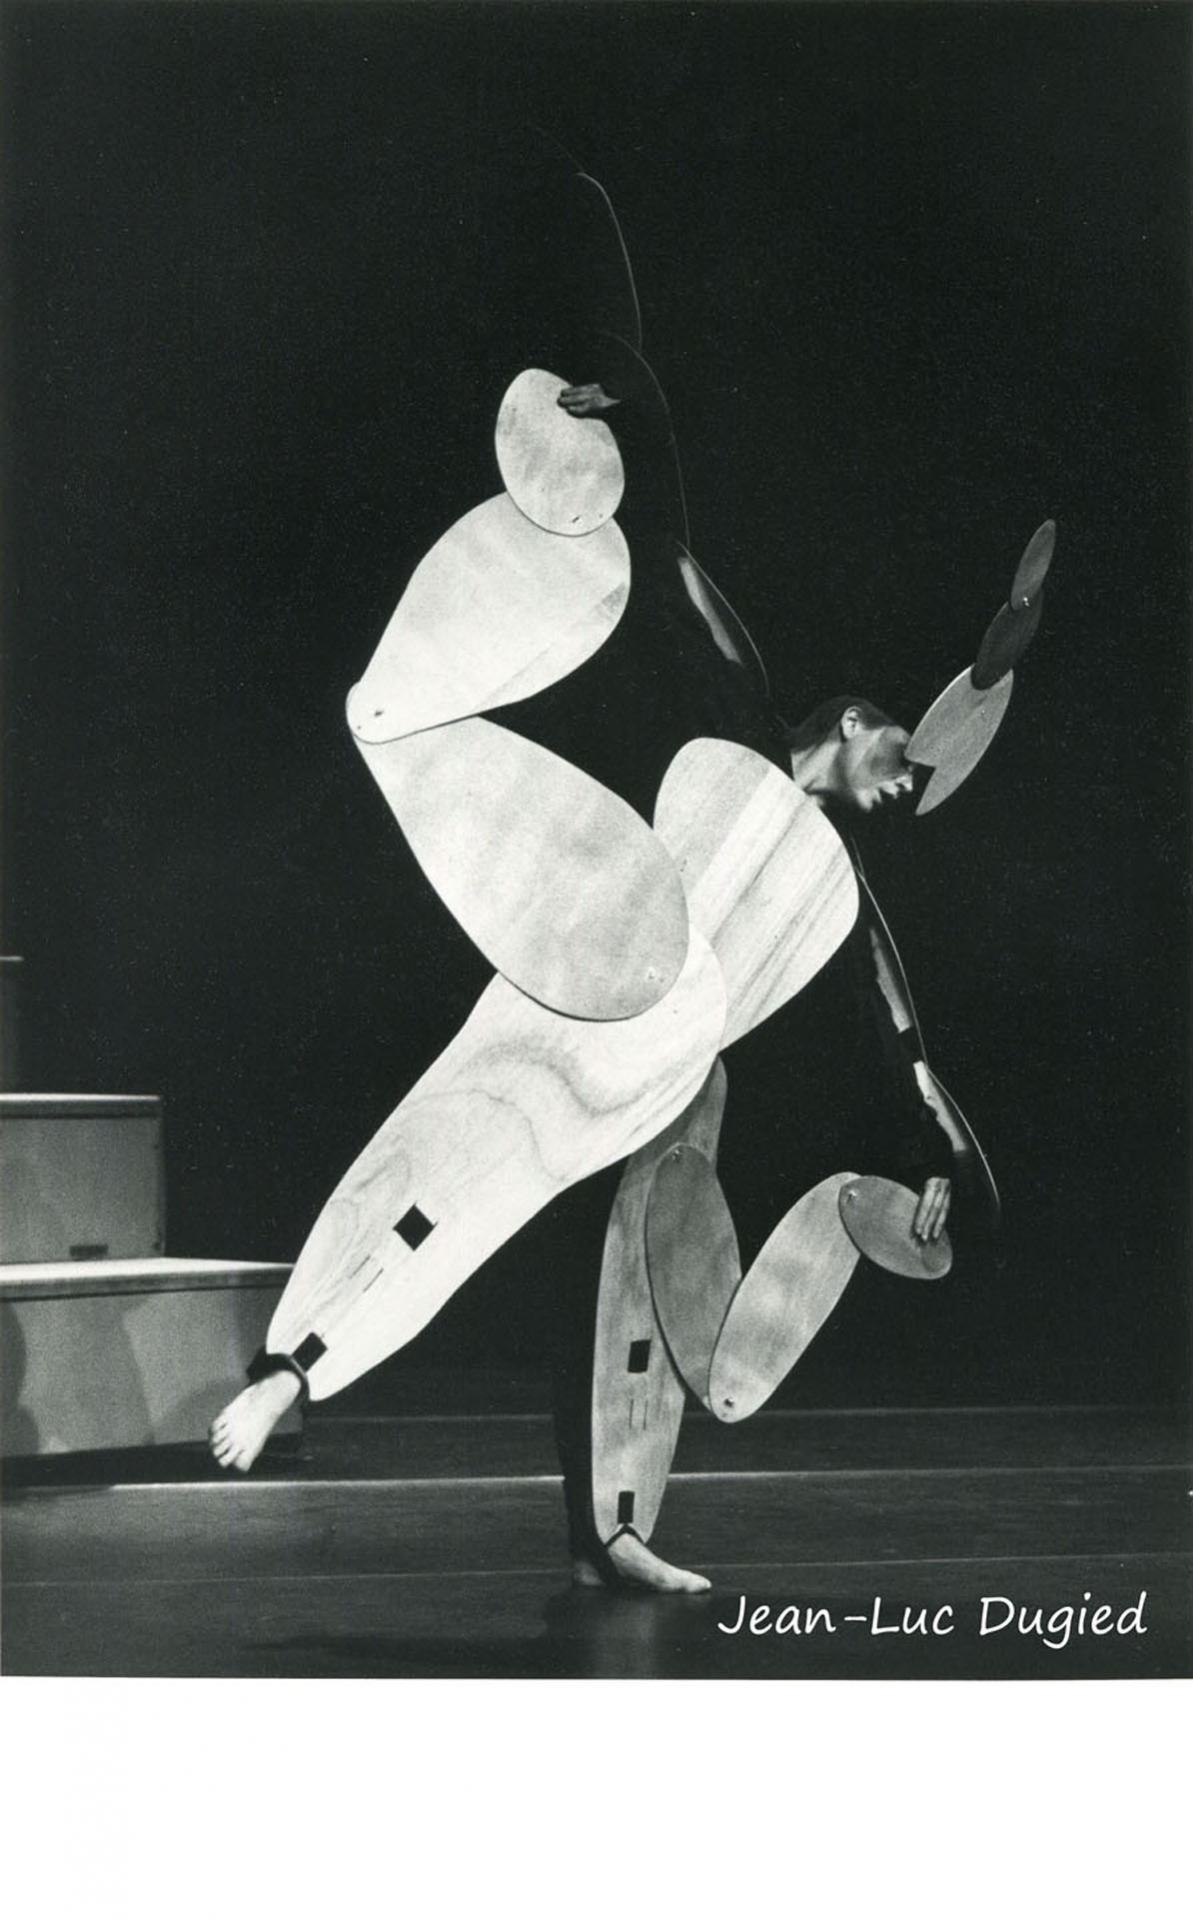 41 Witzman-Anaya Alejandro - histoire des contes futurs - Marianne Piet - 1986